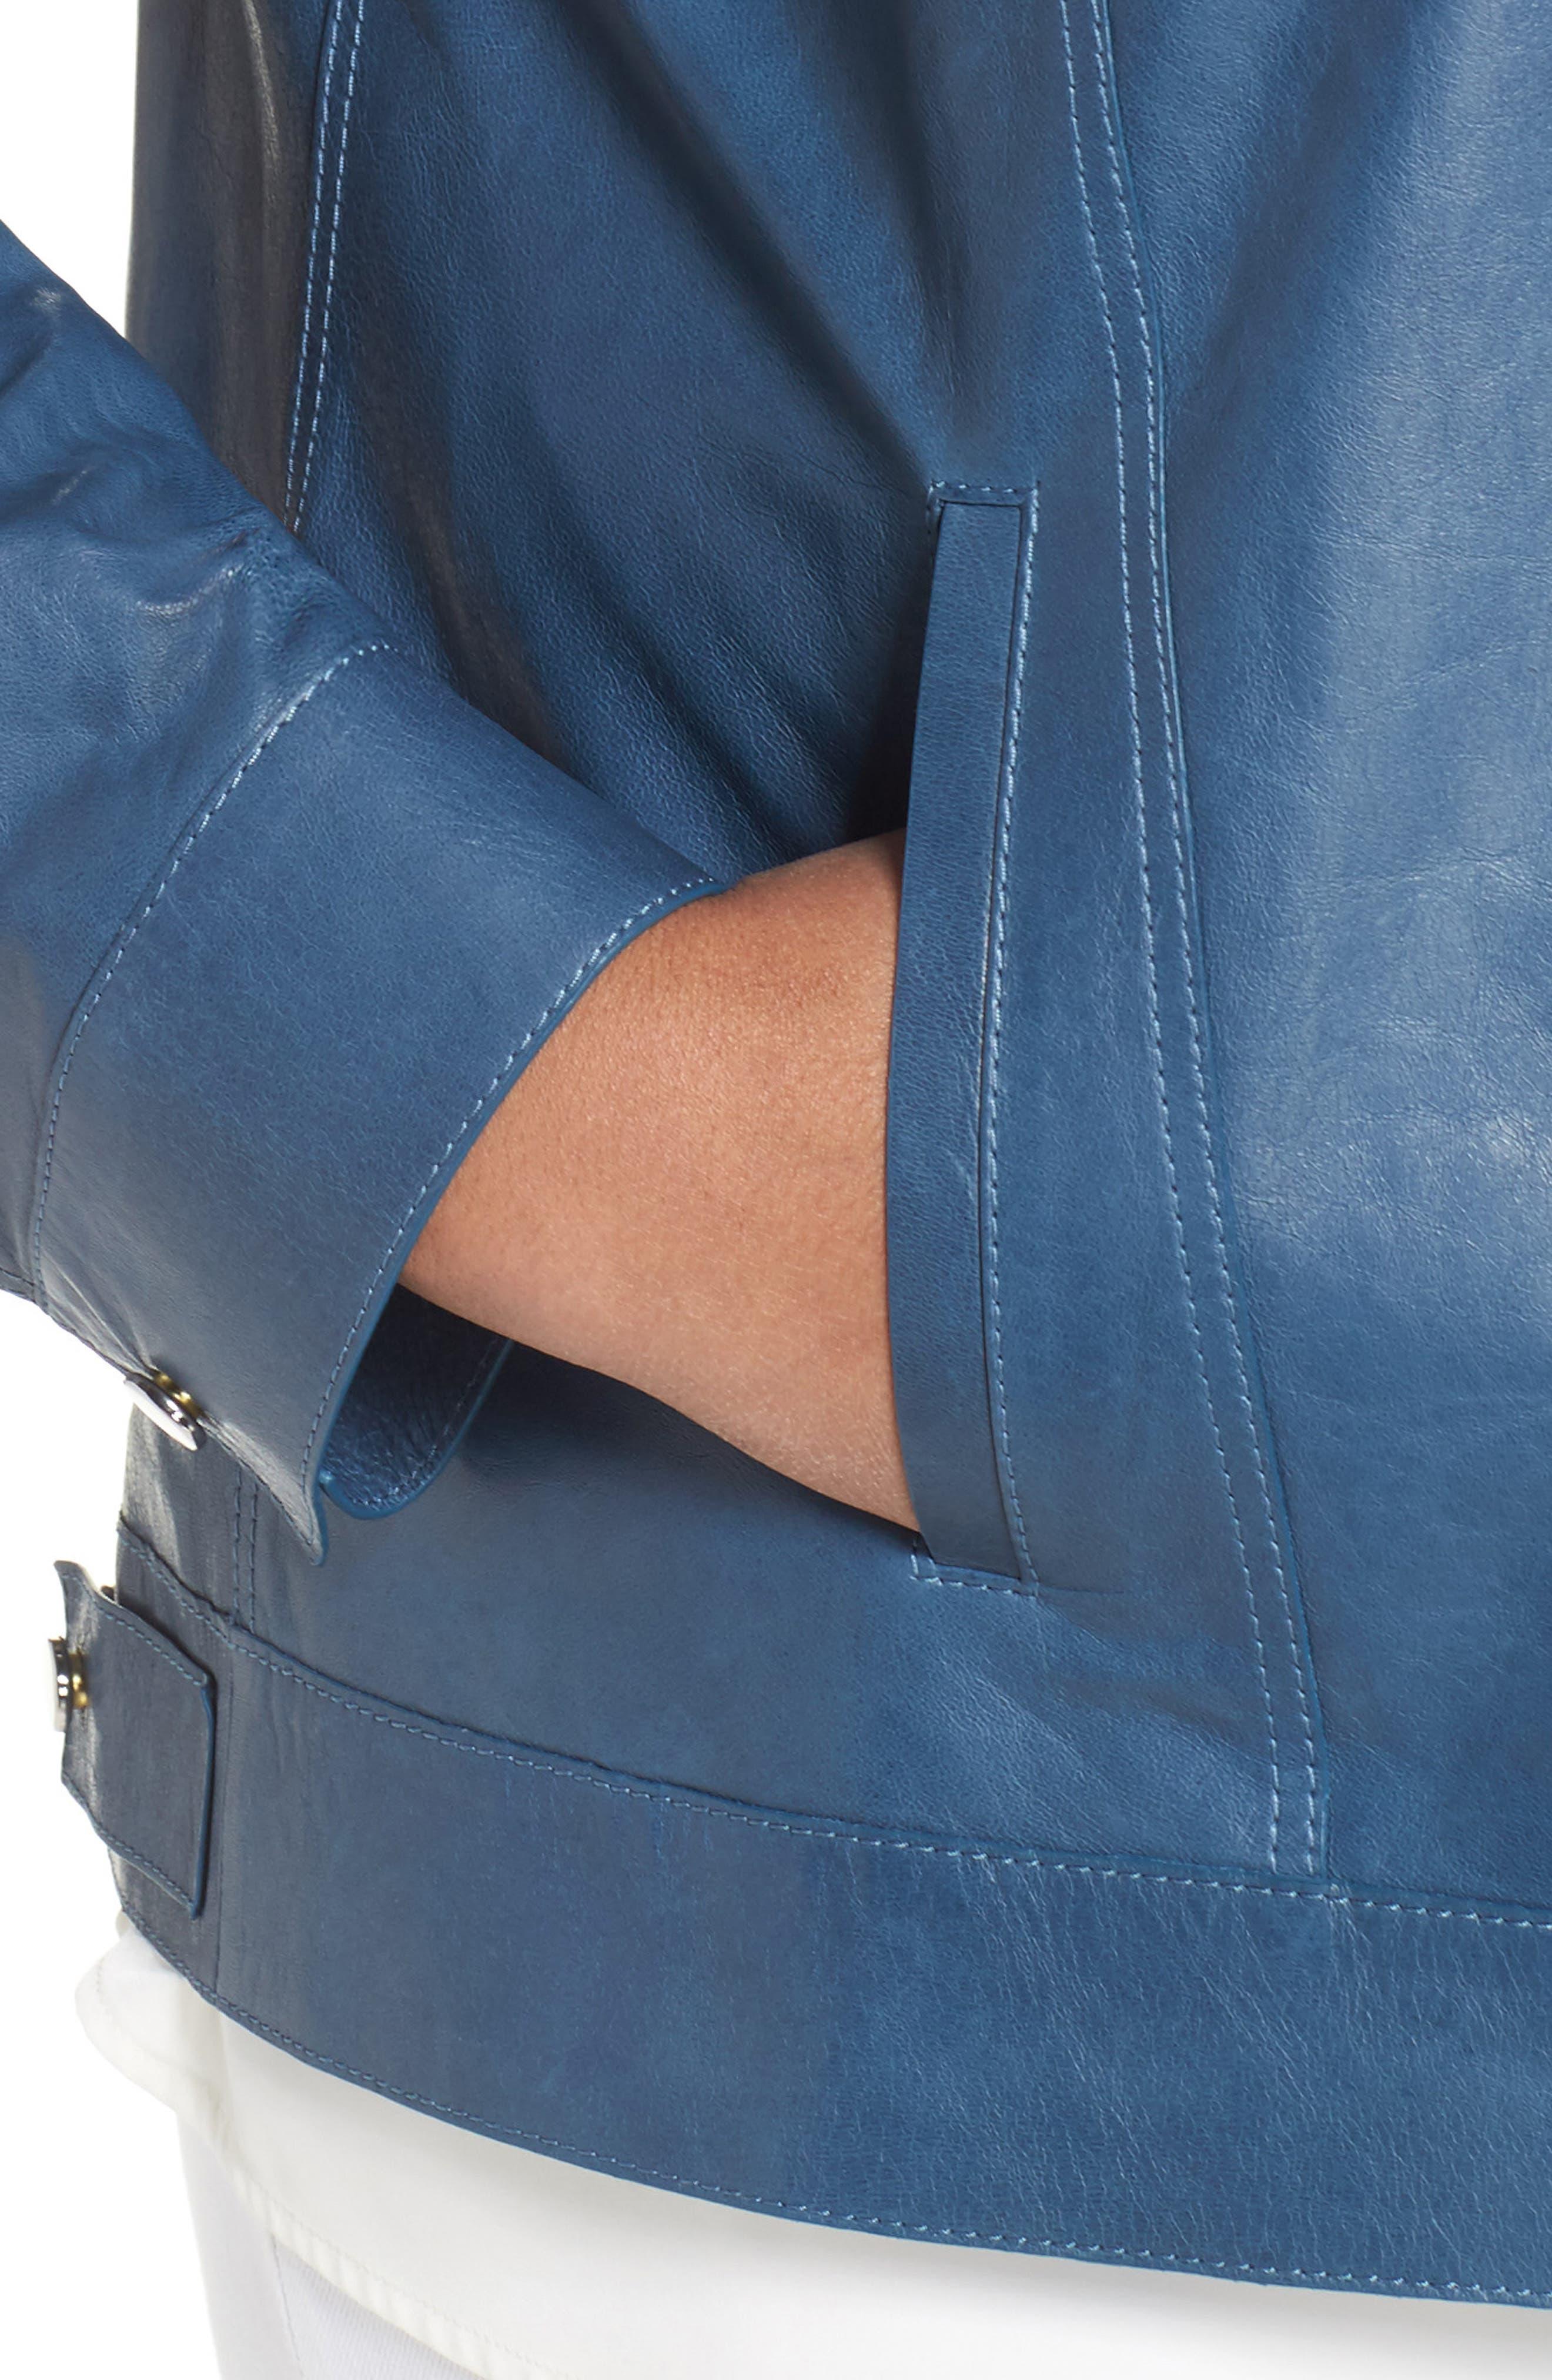 Destiny Leather Jacket,                             Alternate thumbnail 4, color,                             480